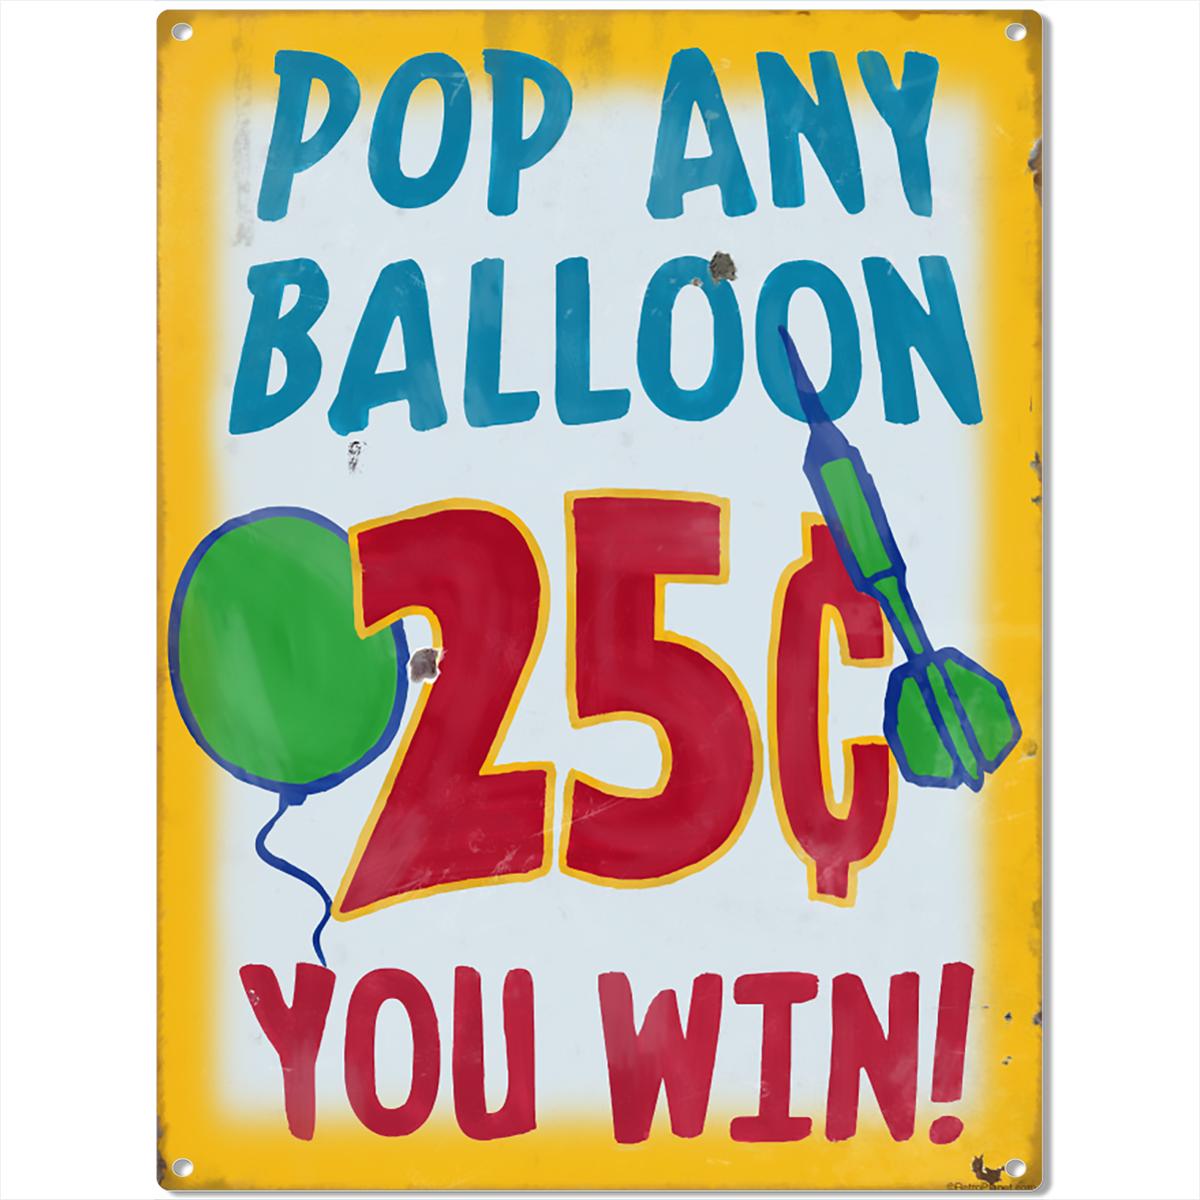 Balloon Darts Carnival Game Metal Sign Vintage Style Game